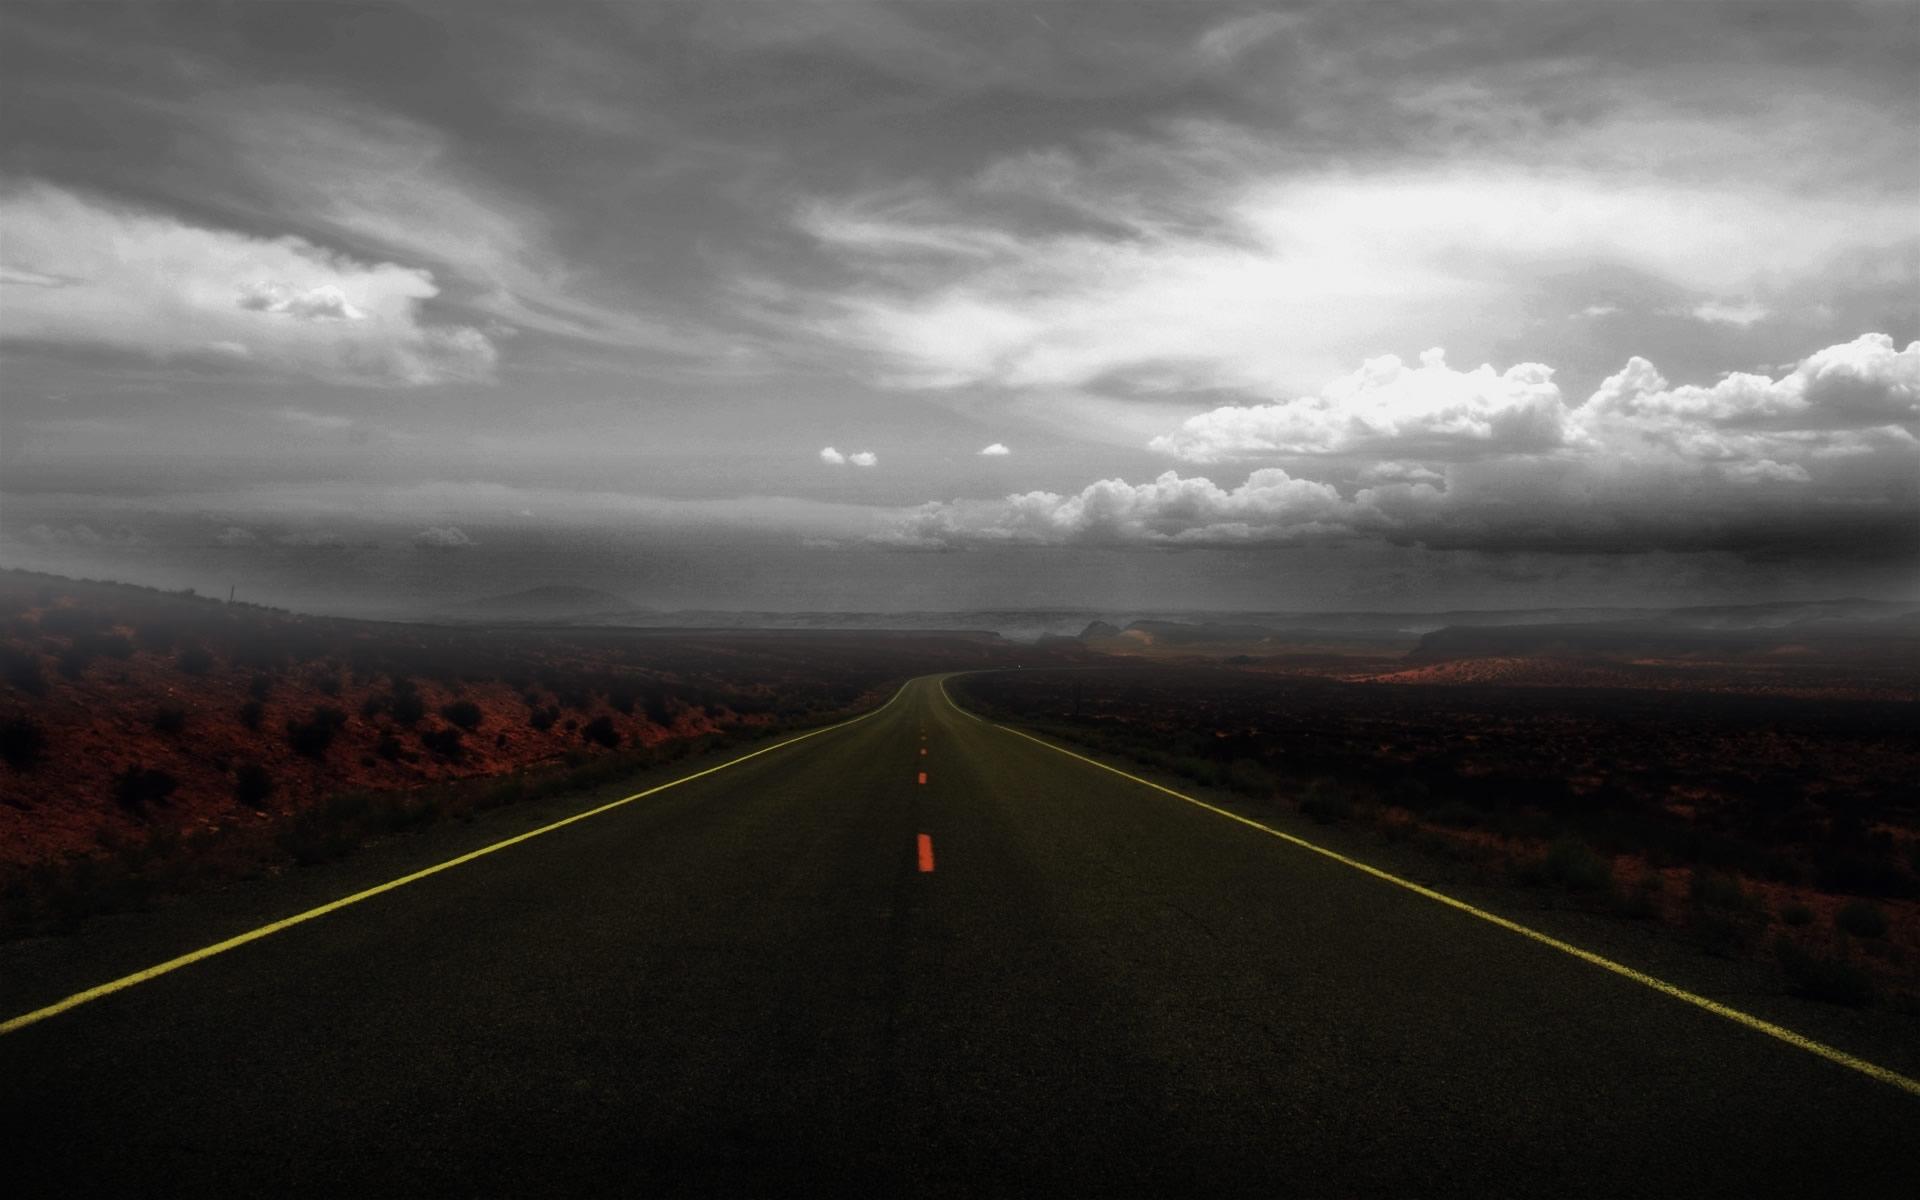 Carretera Solitaria Wallpaper